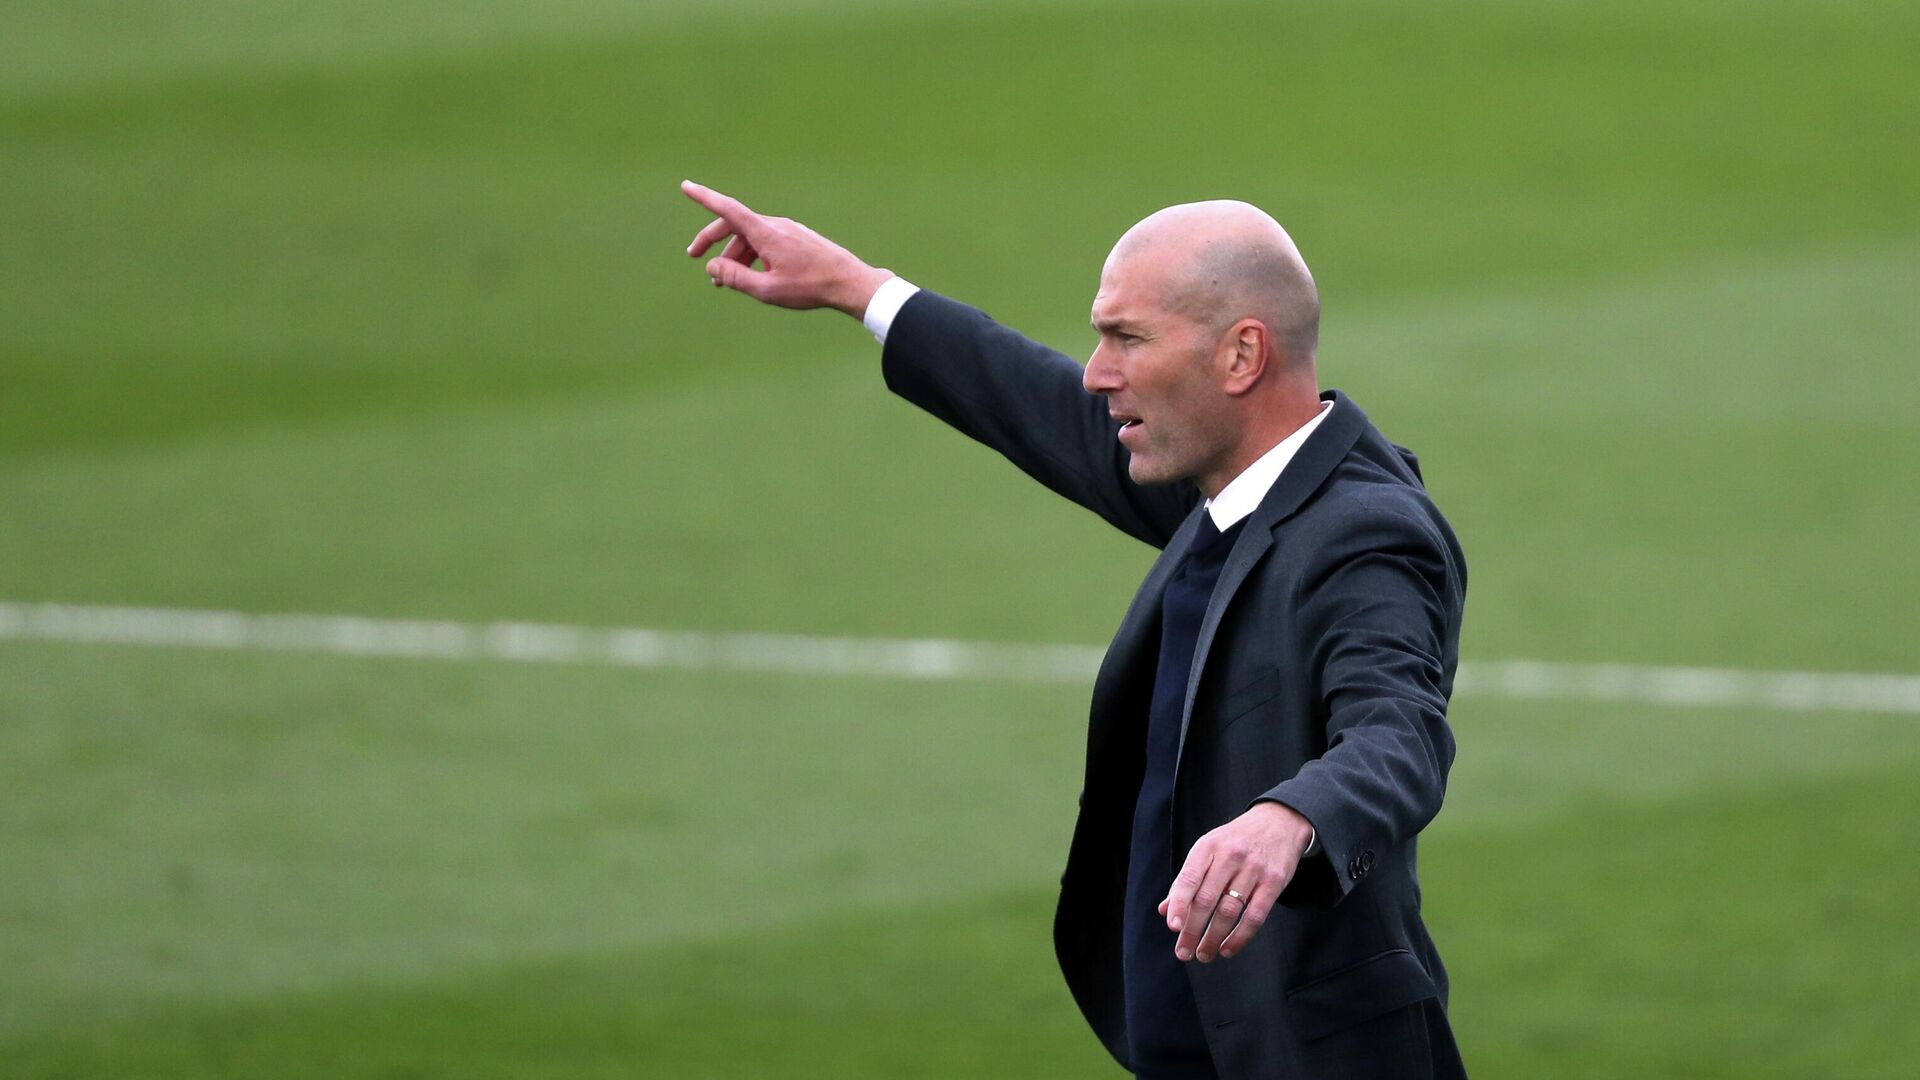 Zinedine Zidane, extécnico de Real Madrid - Sputnik Mundo, 1920, 27.05.2021